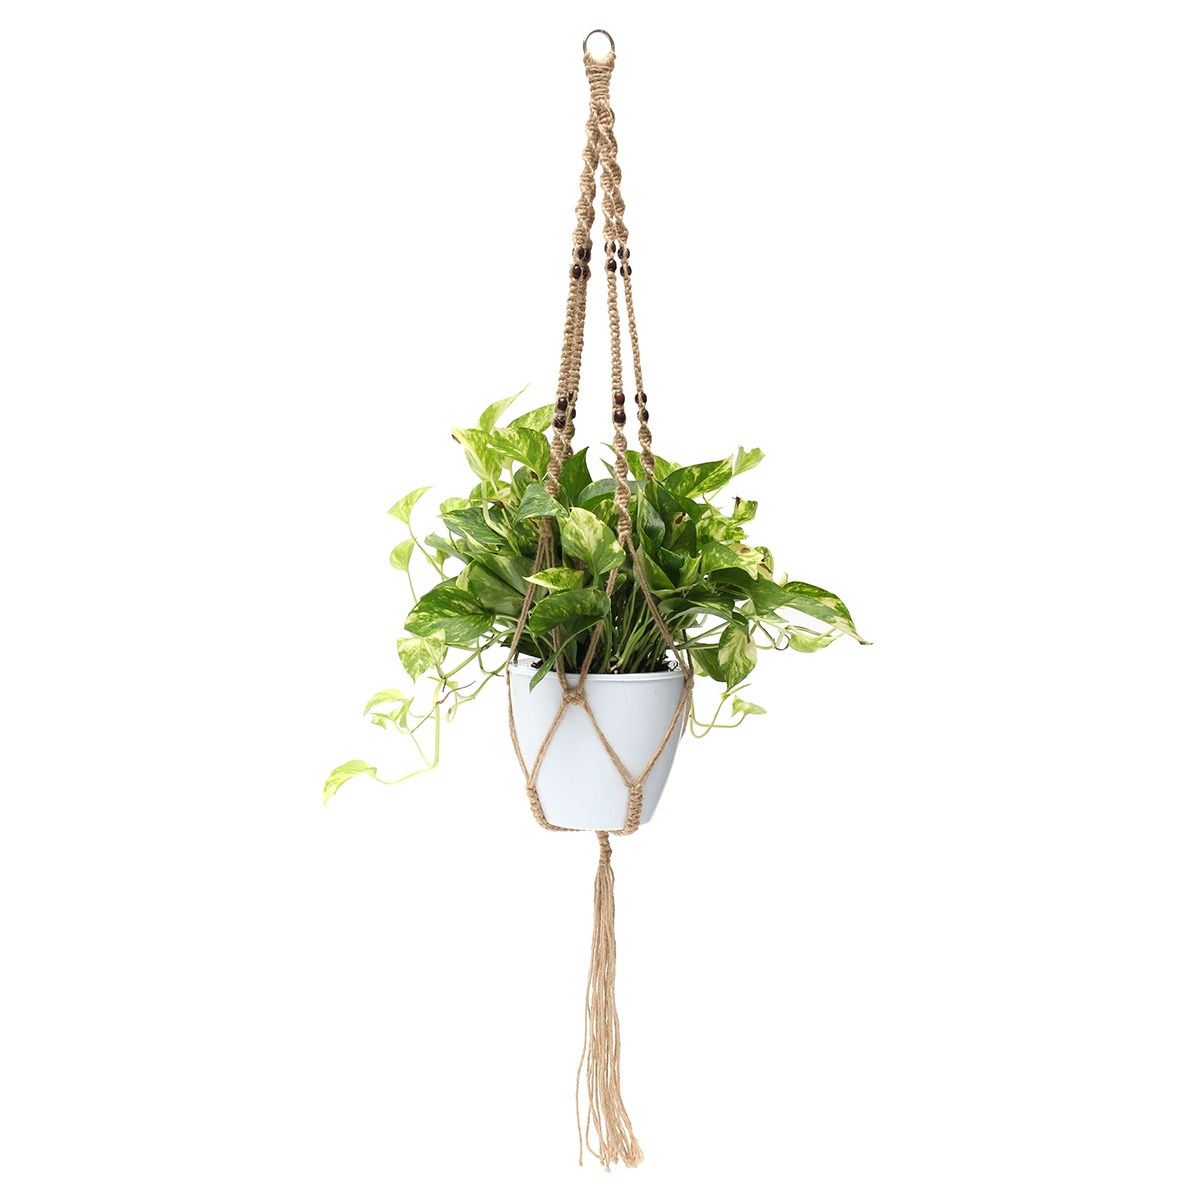 KiWarm 1Pcs New Plant Hanger Macrame Jute Rope Hanging Pots Basket Planter Holder Balcony Macrame Cord Rope